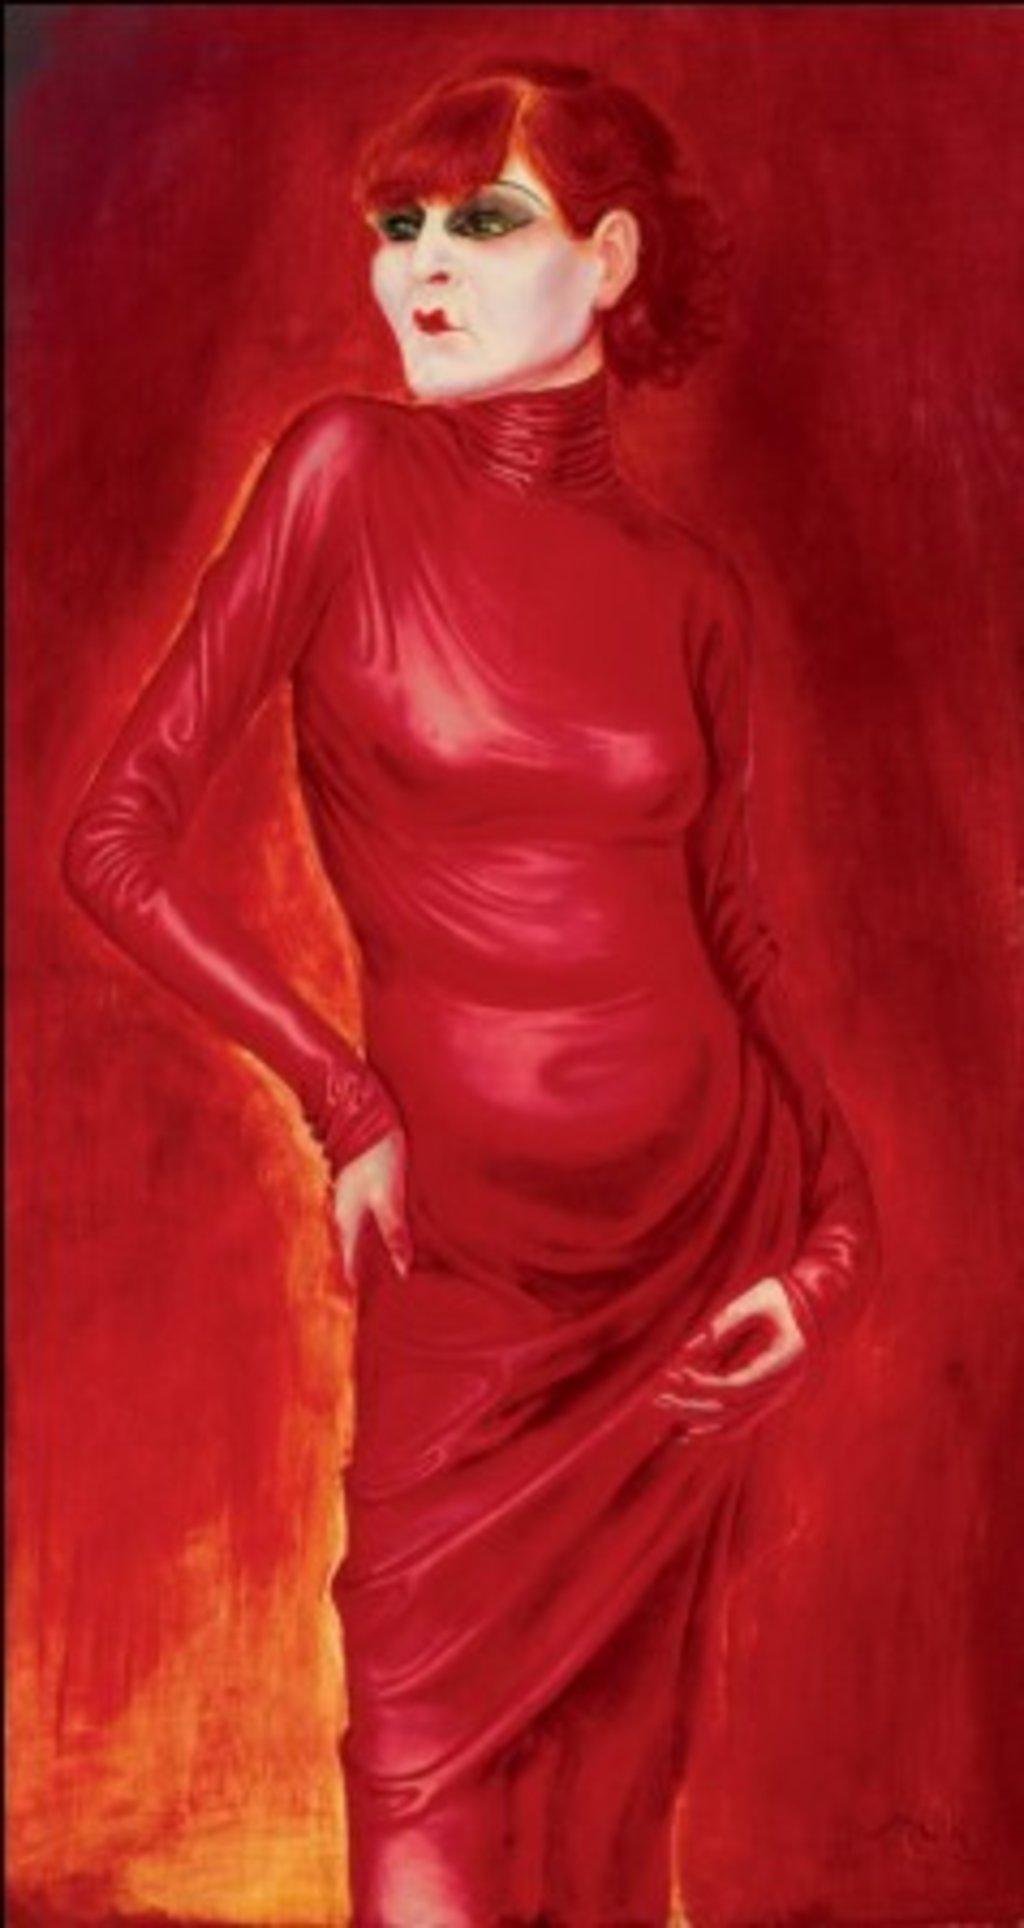 6._Portrait_of_the_Dancer_Anita_Berber_1925-compressed[1]